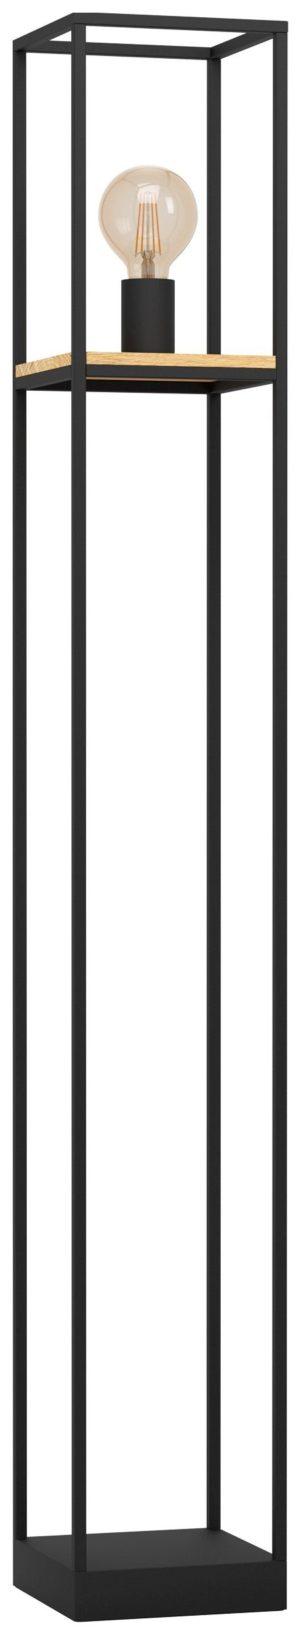 Libertad vloerlamp - zwart - bruin Eglo Vloerlamp 99798-EGLO